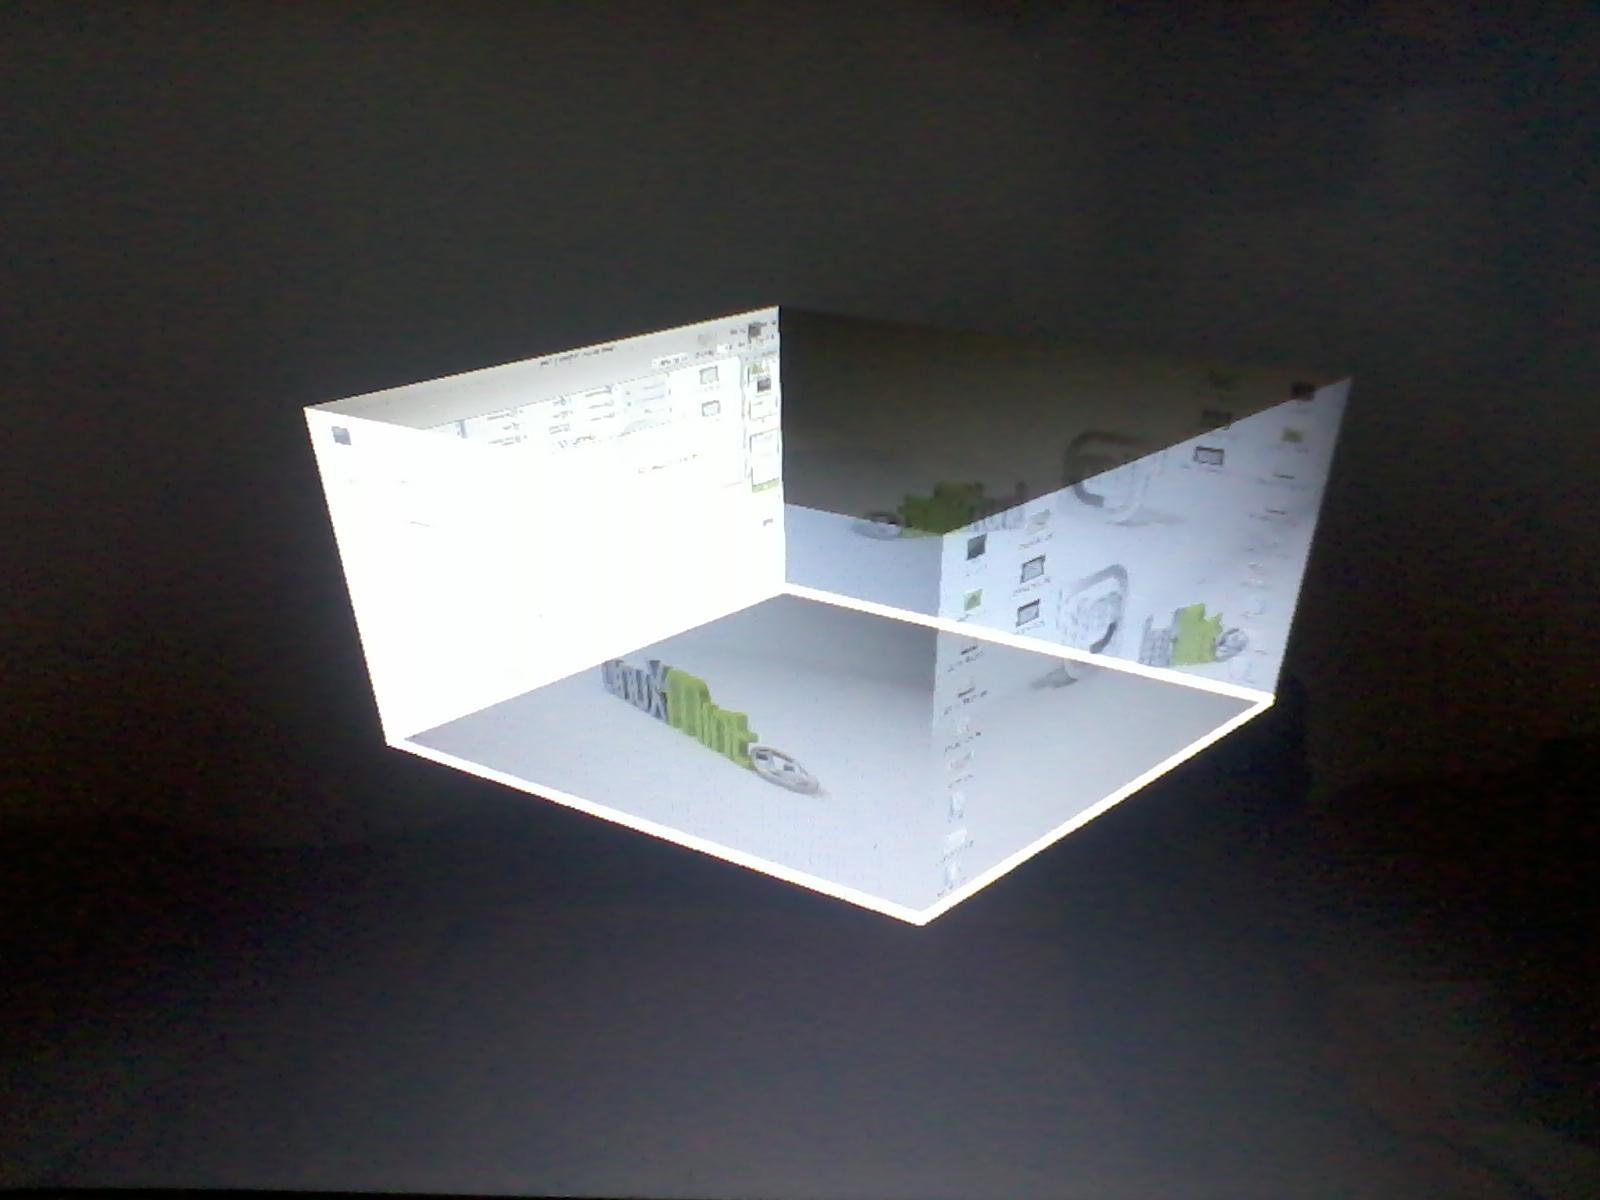 dekstop cube compiz